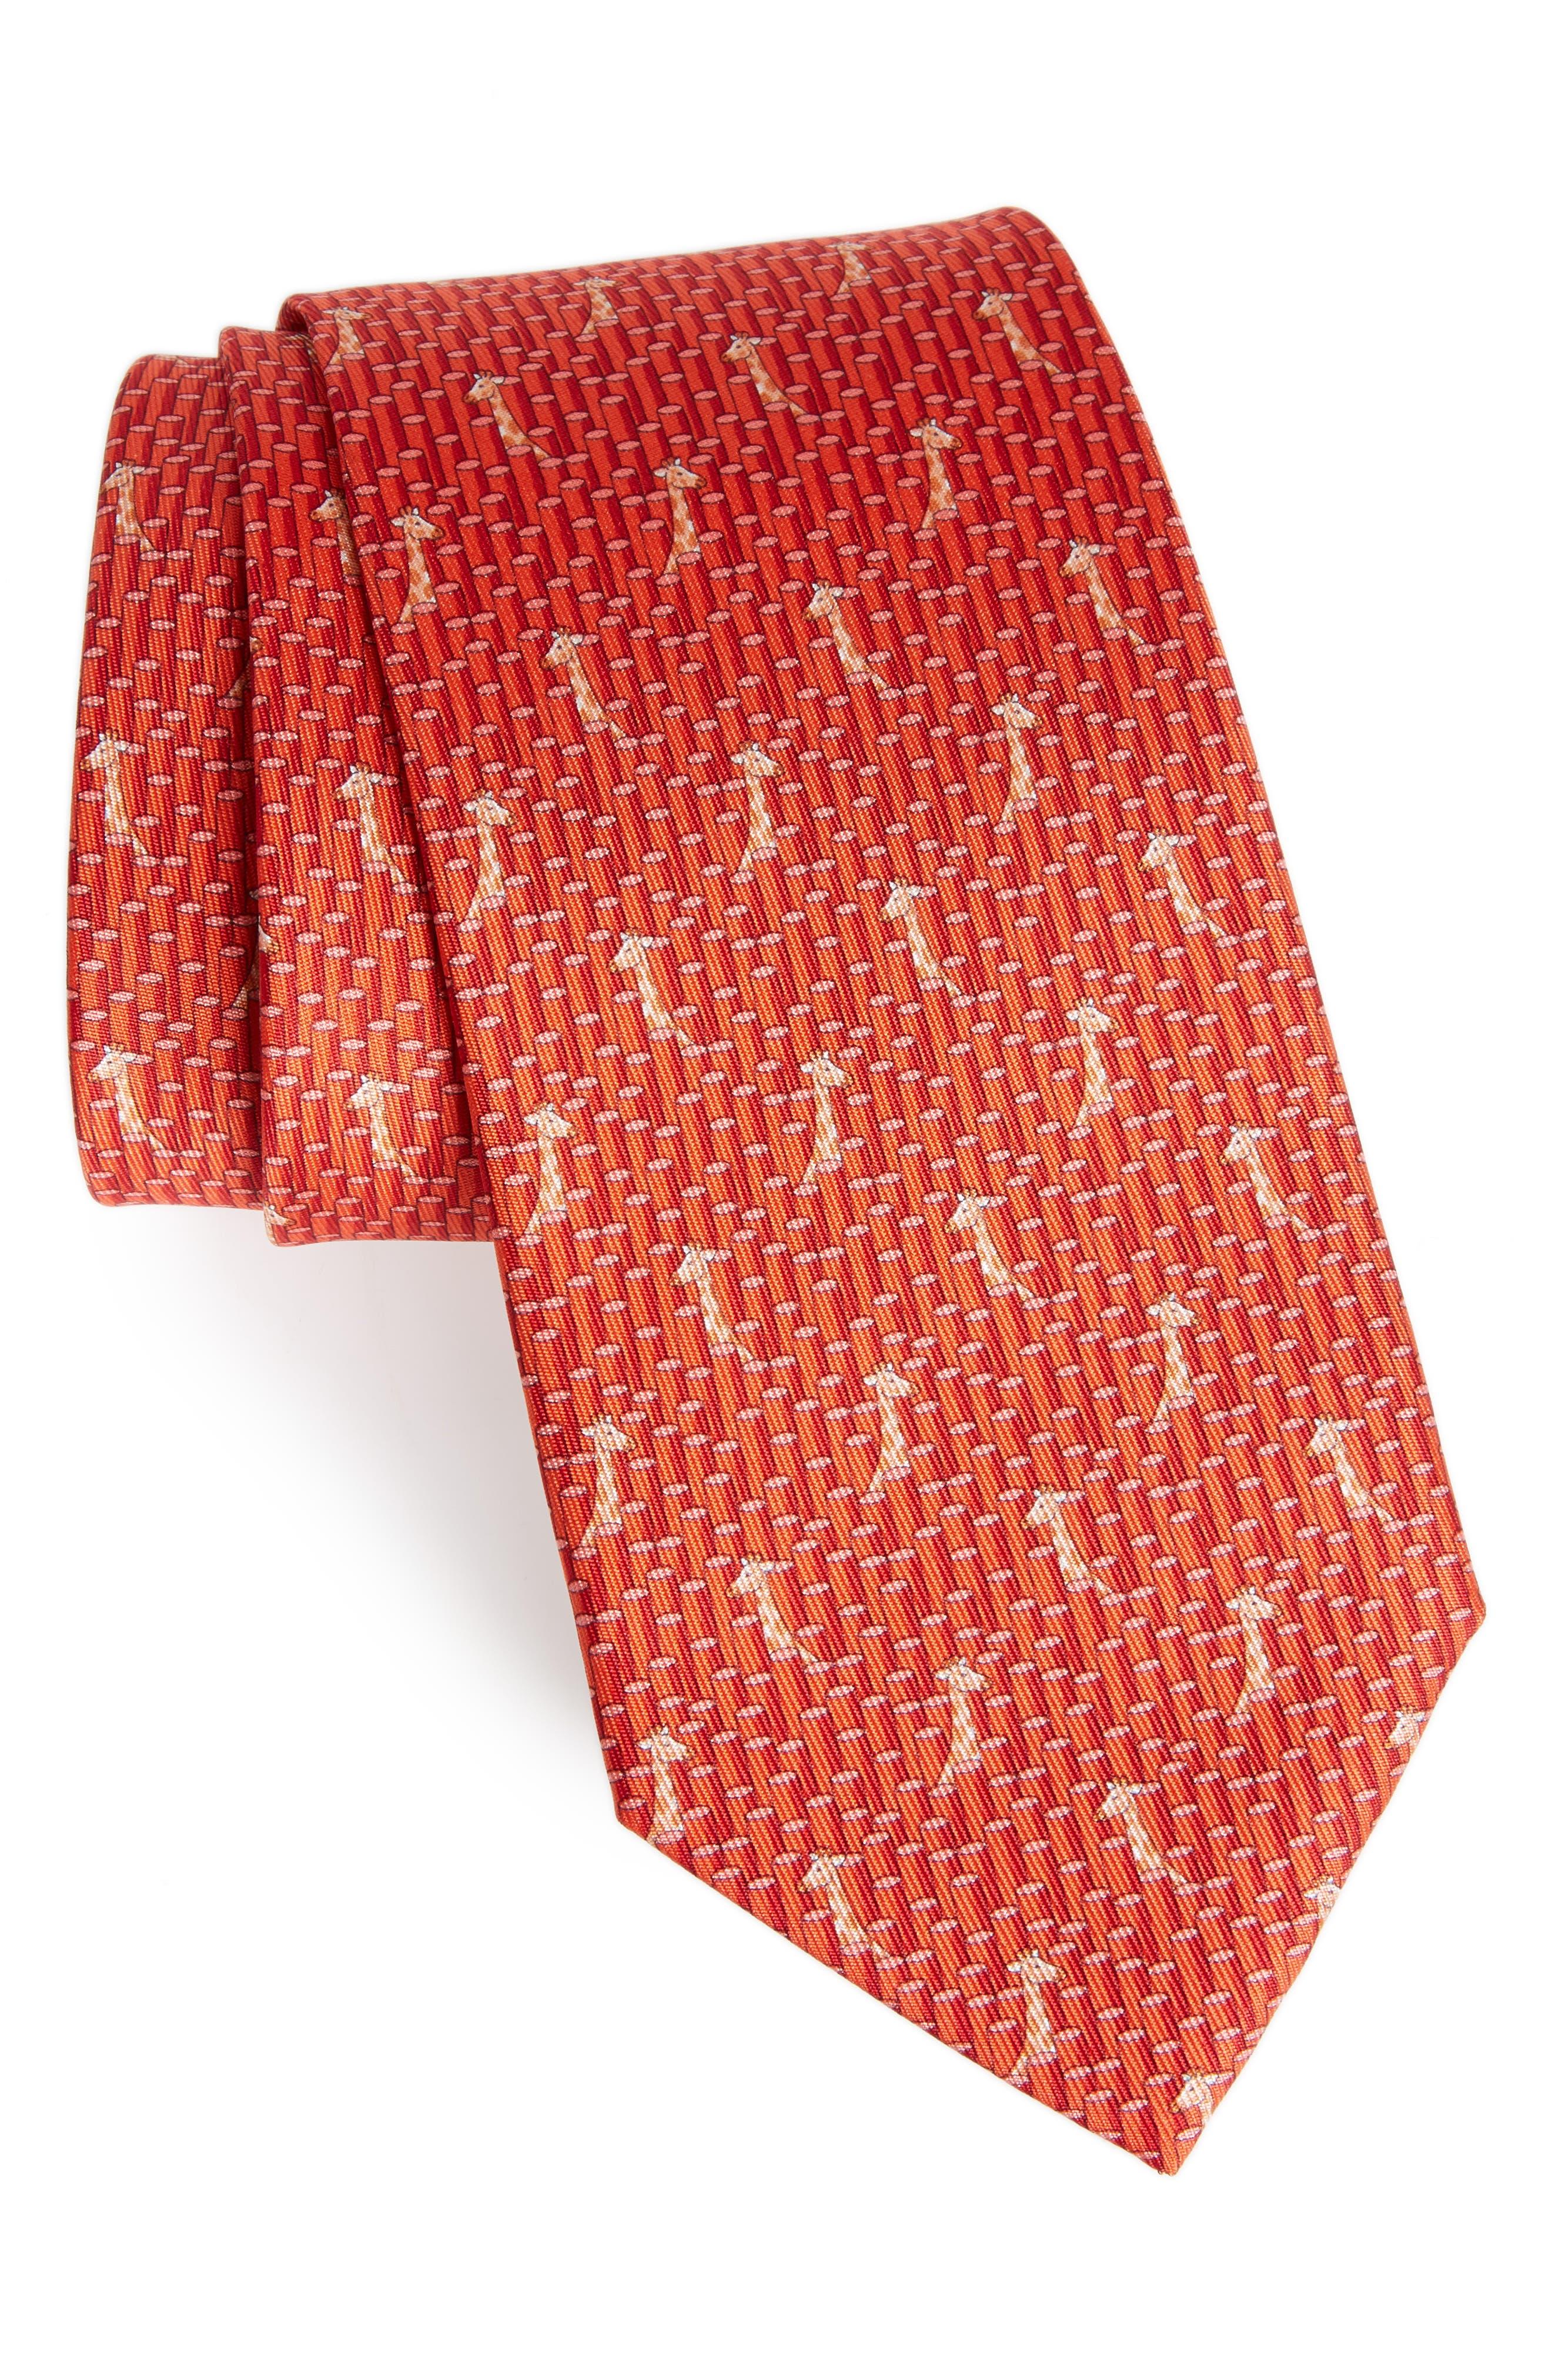 Giraffe Print Silk Tie,                             Main thumbnail 1, color,                             Red